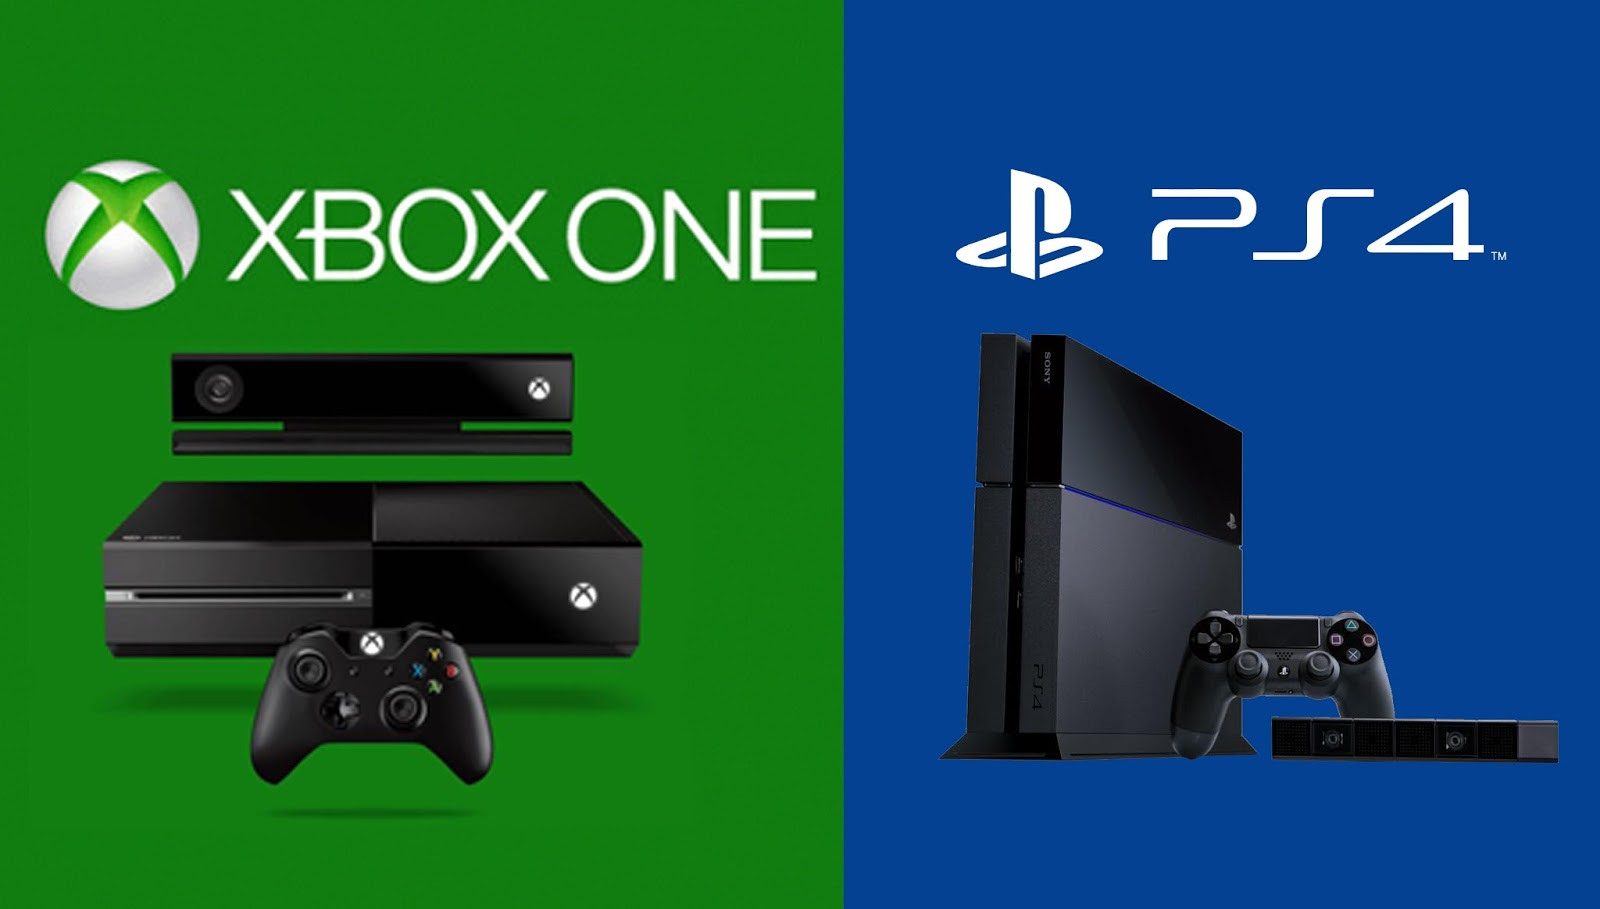 Xbox One Vs Ps4 : Ps vs xbox one